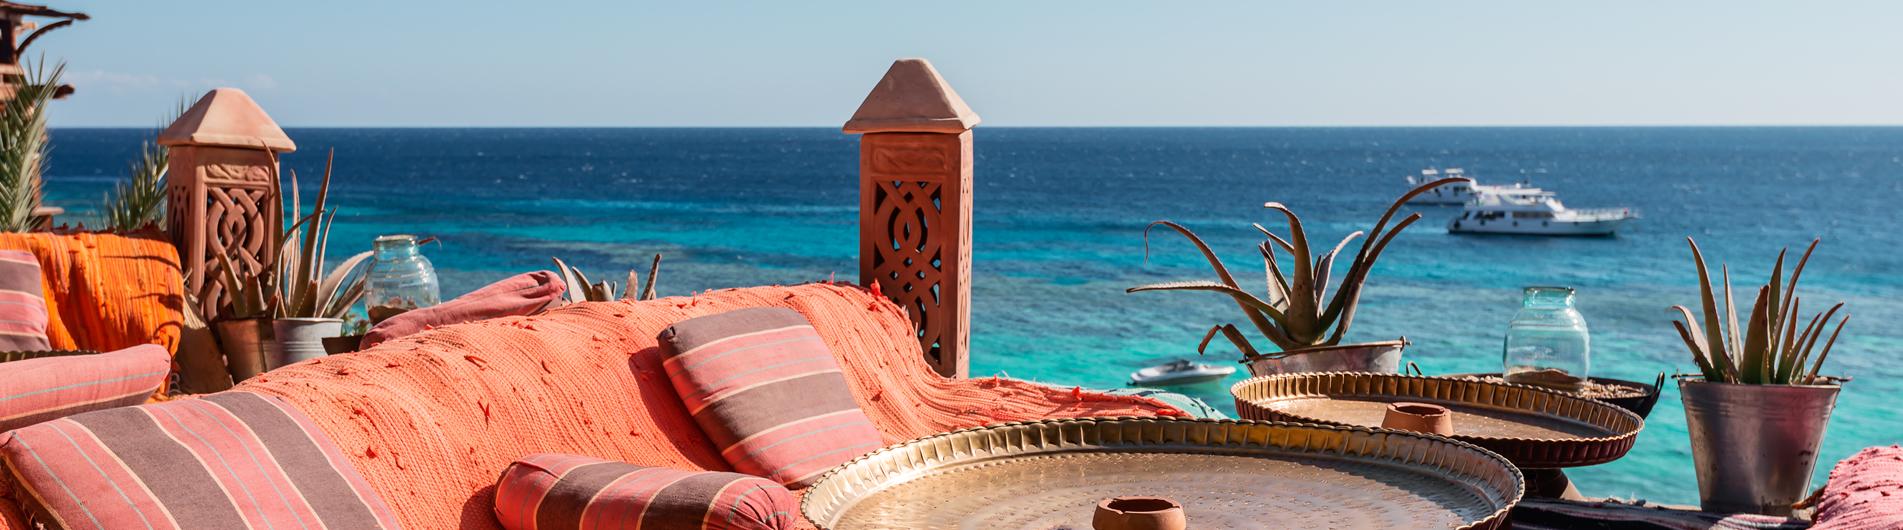 Hurghada Holidays